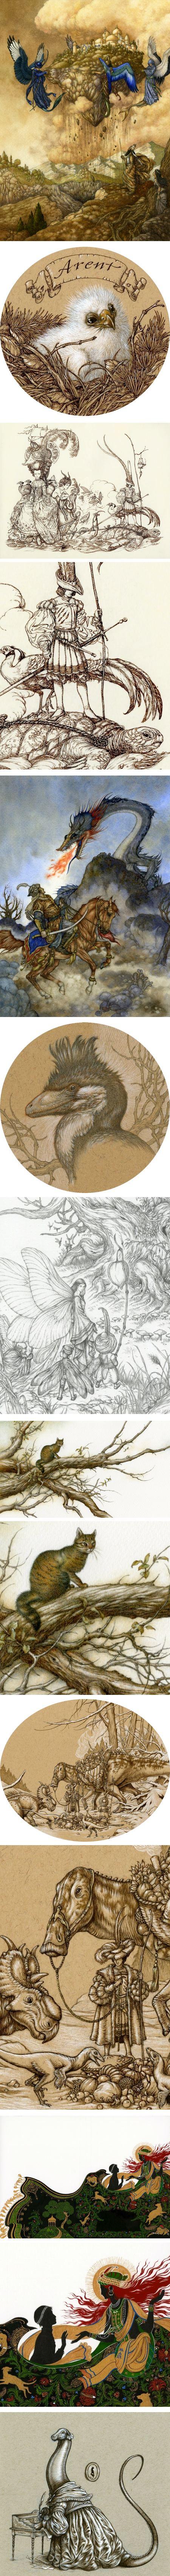 Niroot Puttapipat (himmapaan), illustration and paleo art